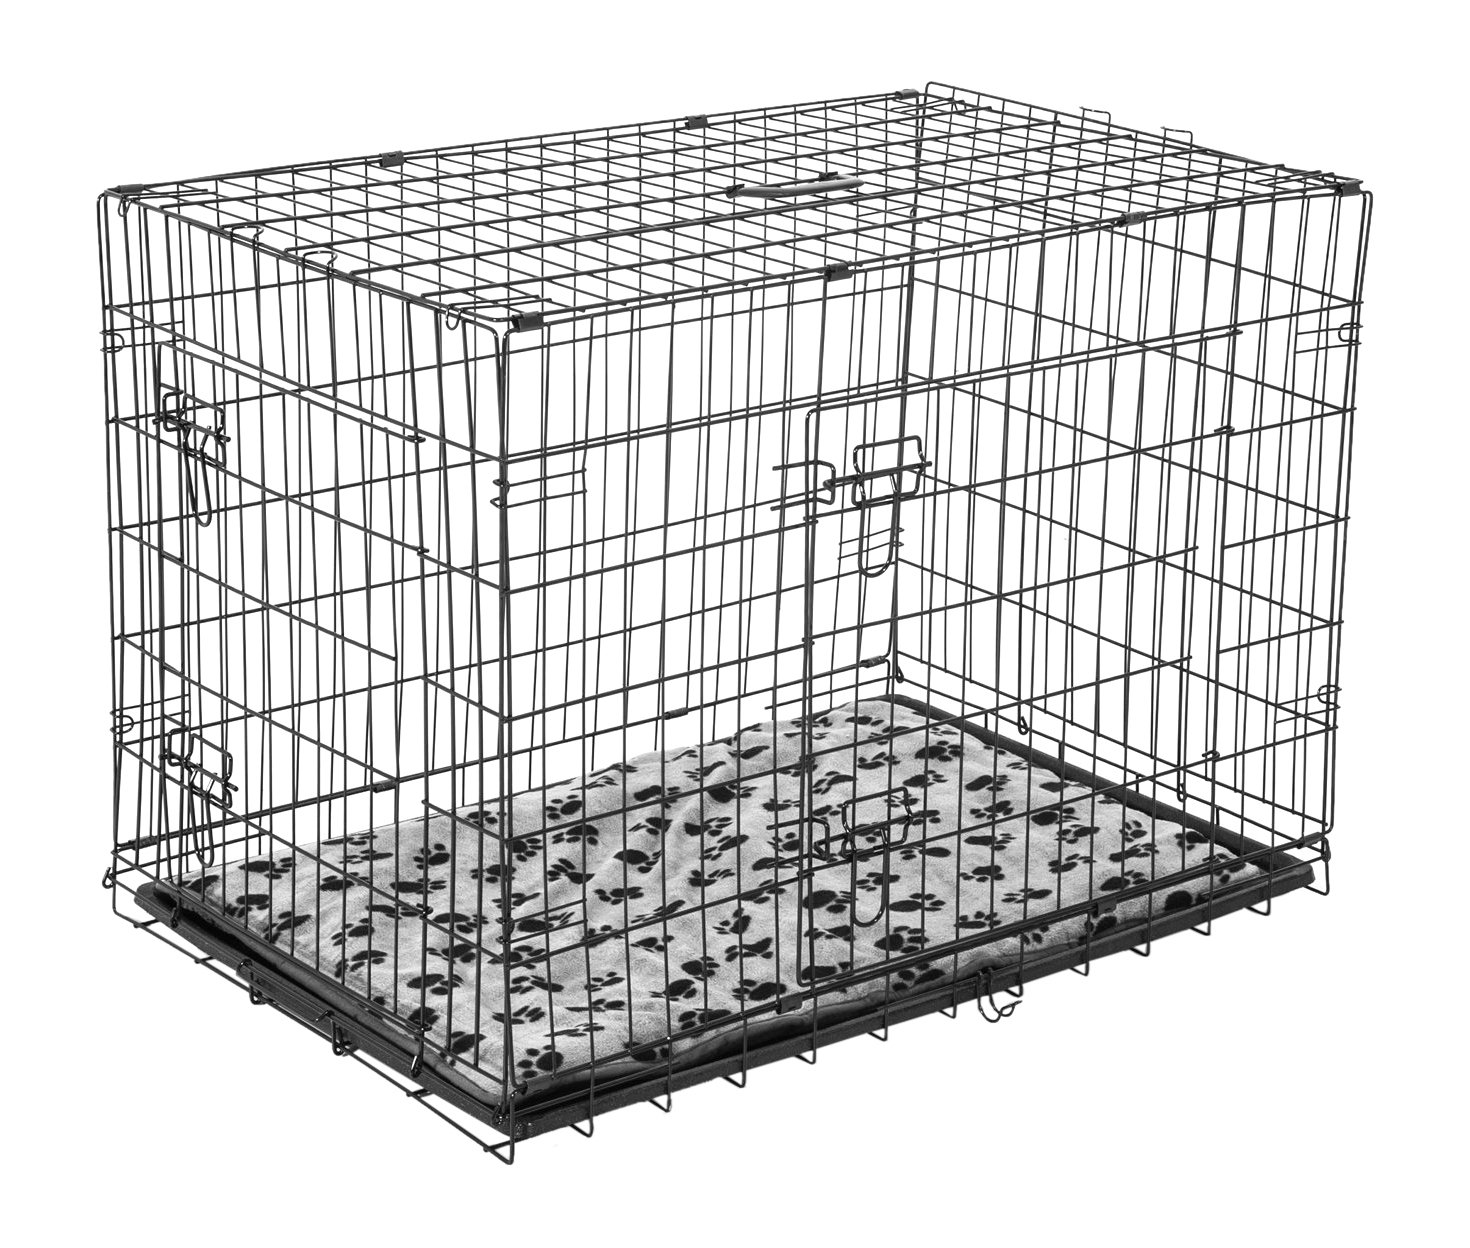 PawHut Transport / Drahtkäfig Hundebox mit Kissen, XL, schwarz